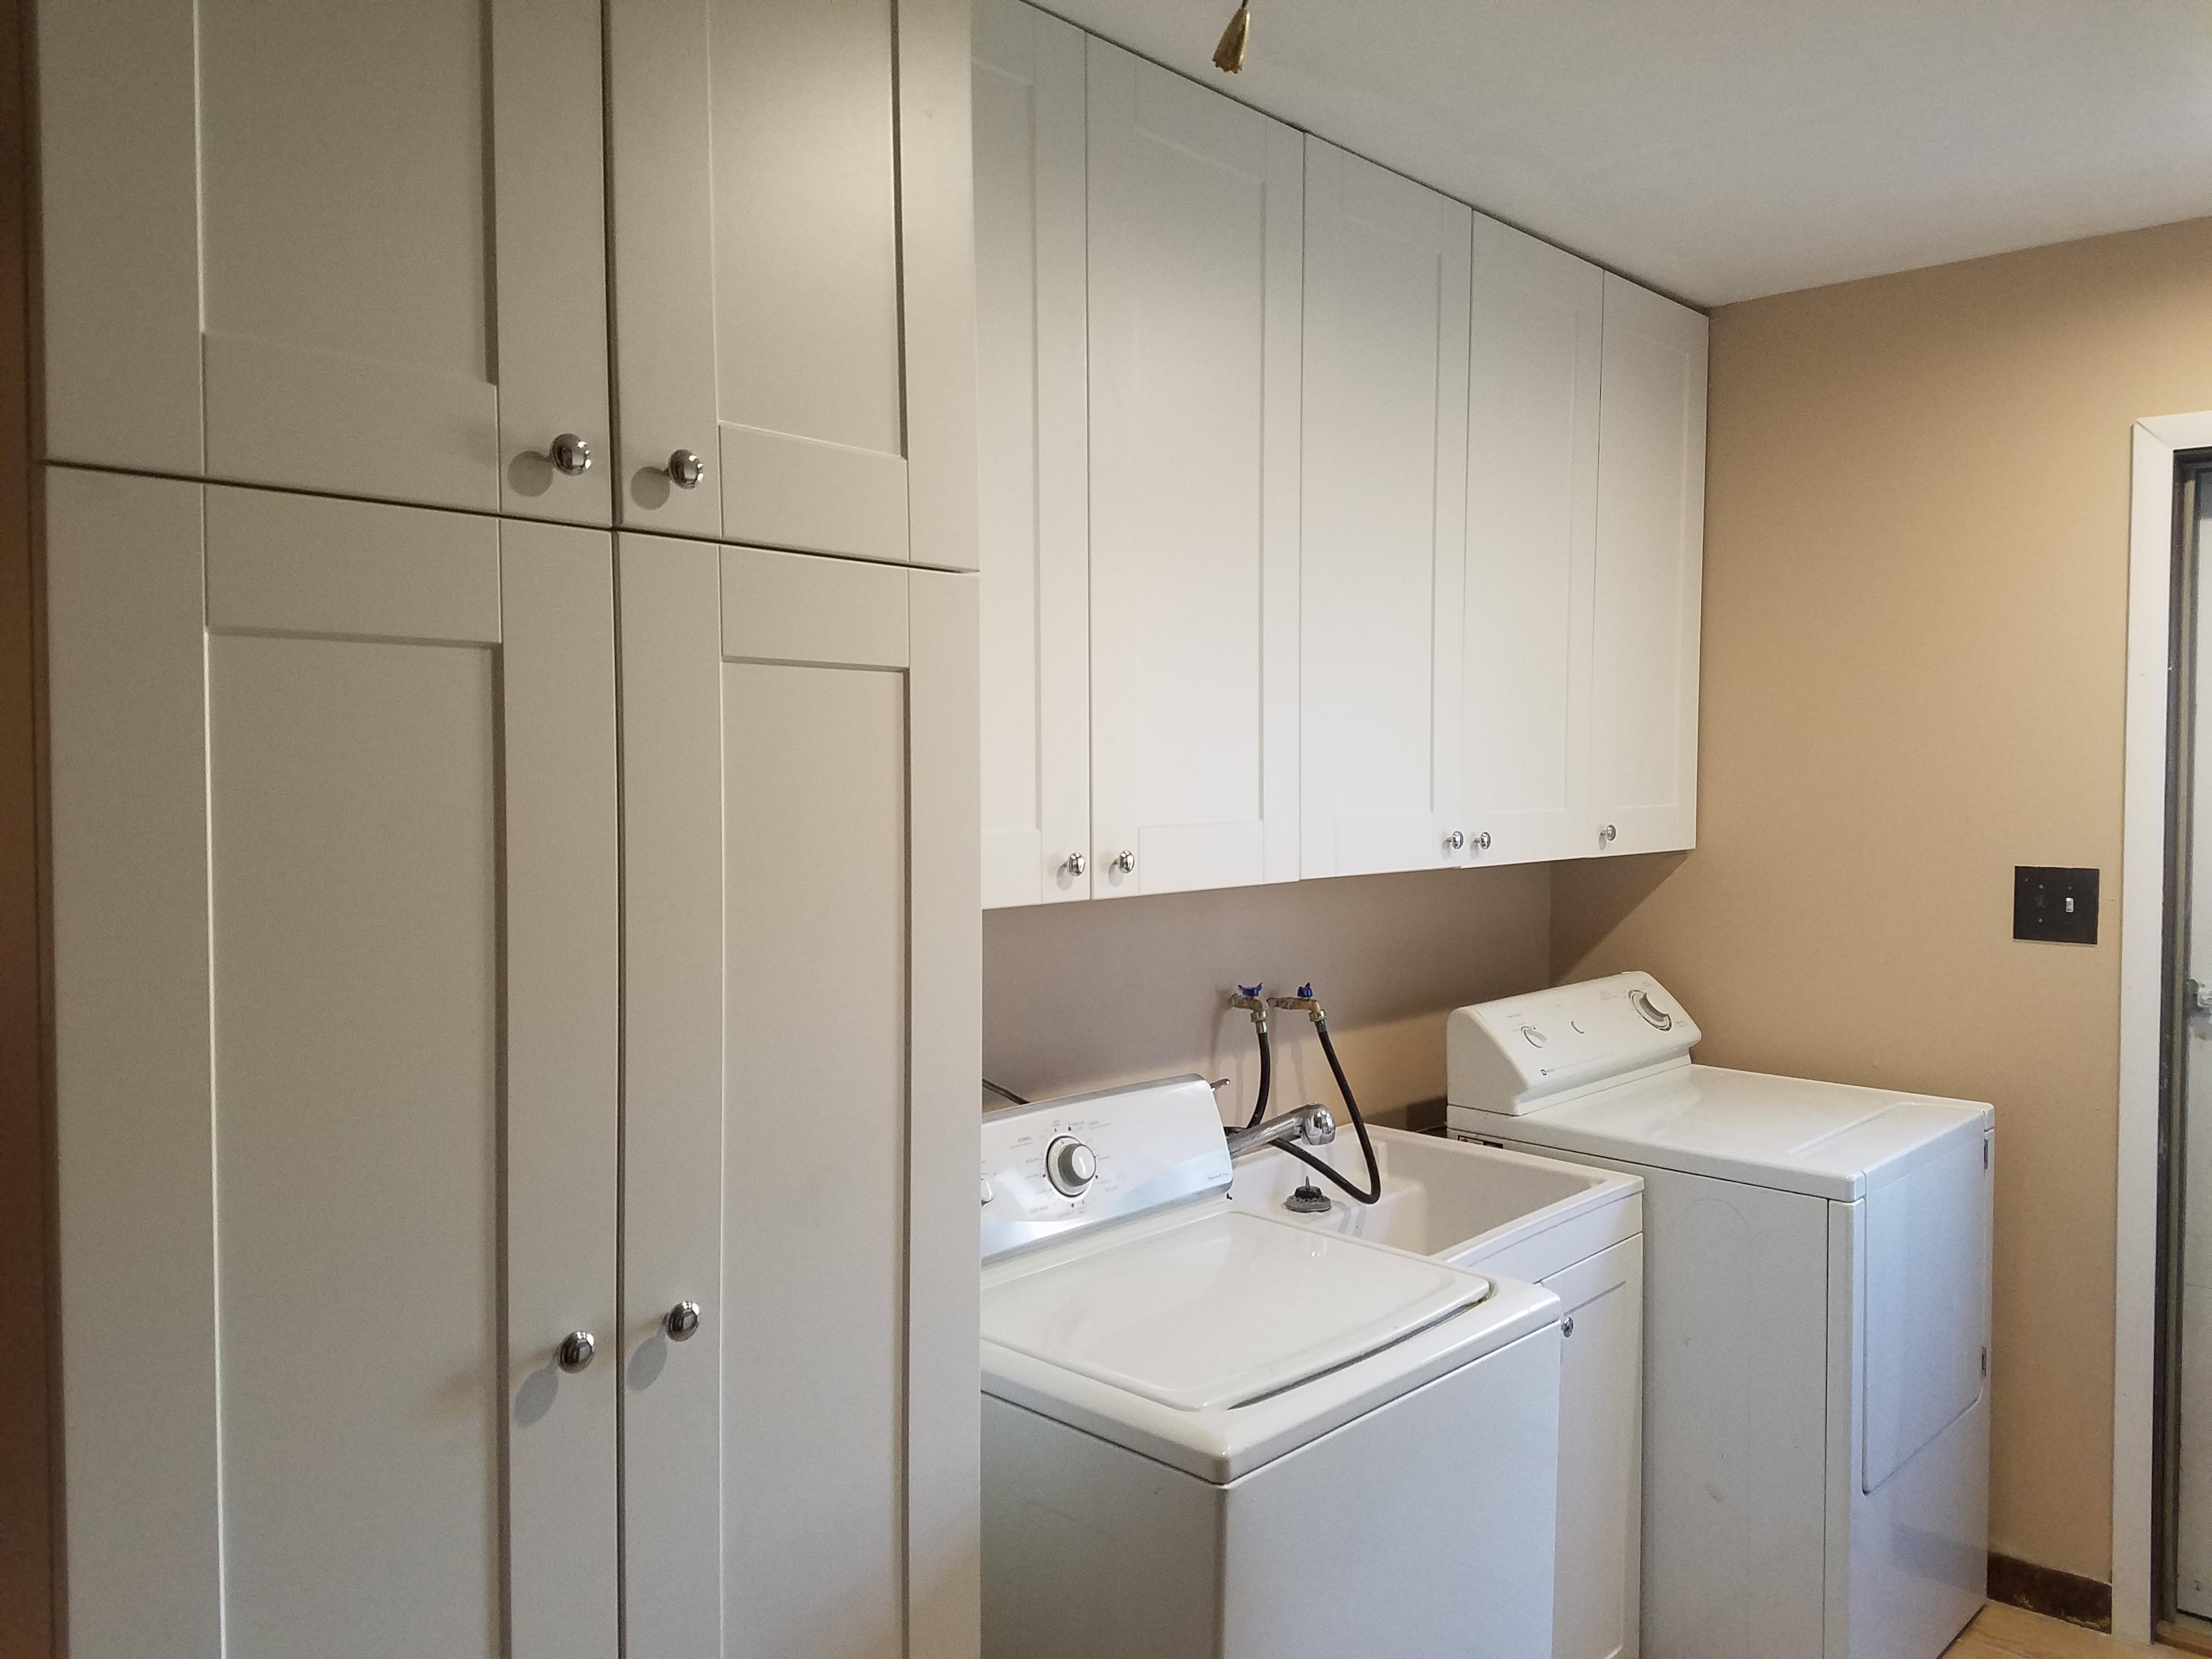 Kitchen Remodeling Tinley ParkMerillat Cabinetry Project Photos - Bathroom remodeling tinley park il